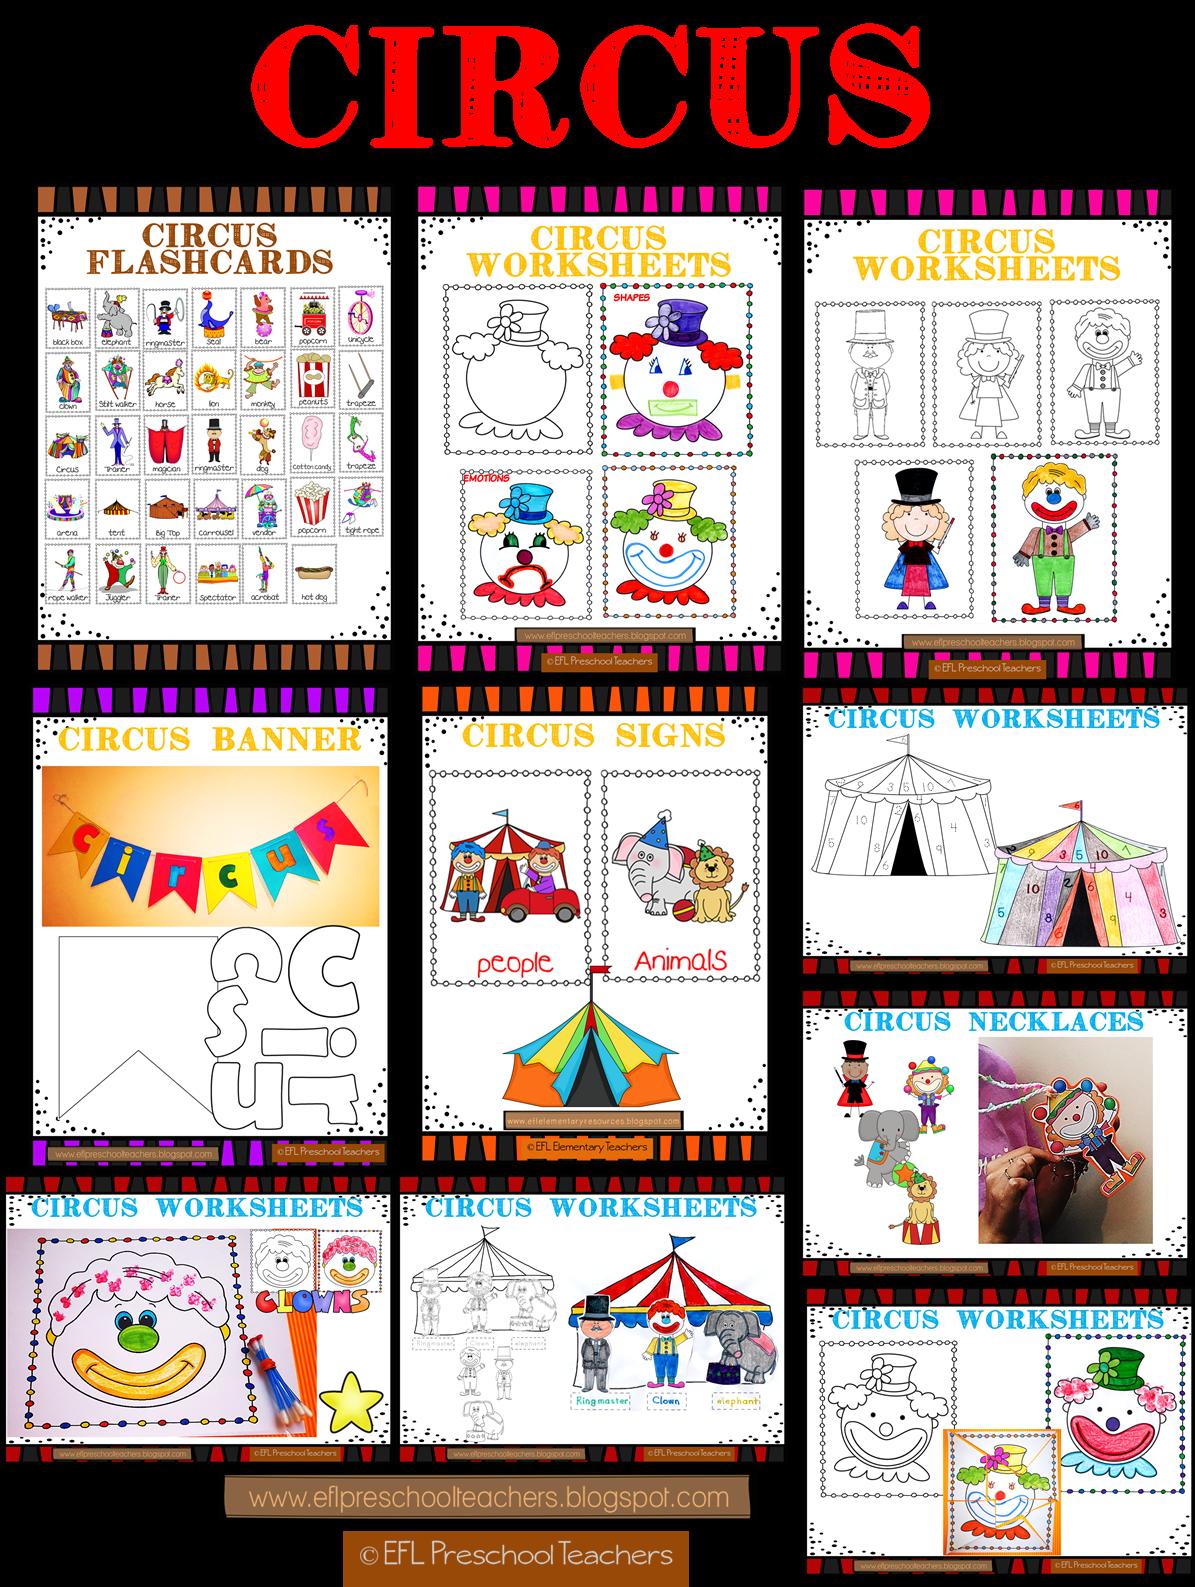 Efl Elementary Teachers Circus Unit For The Elementary Ell